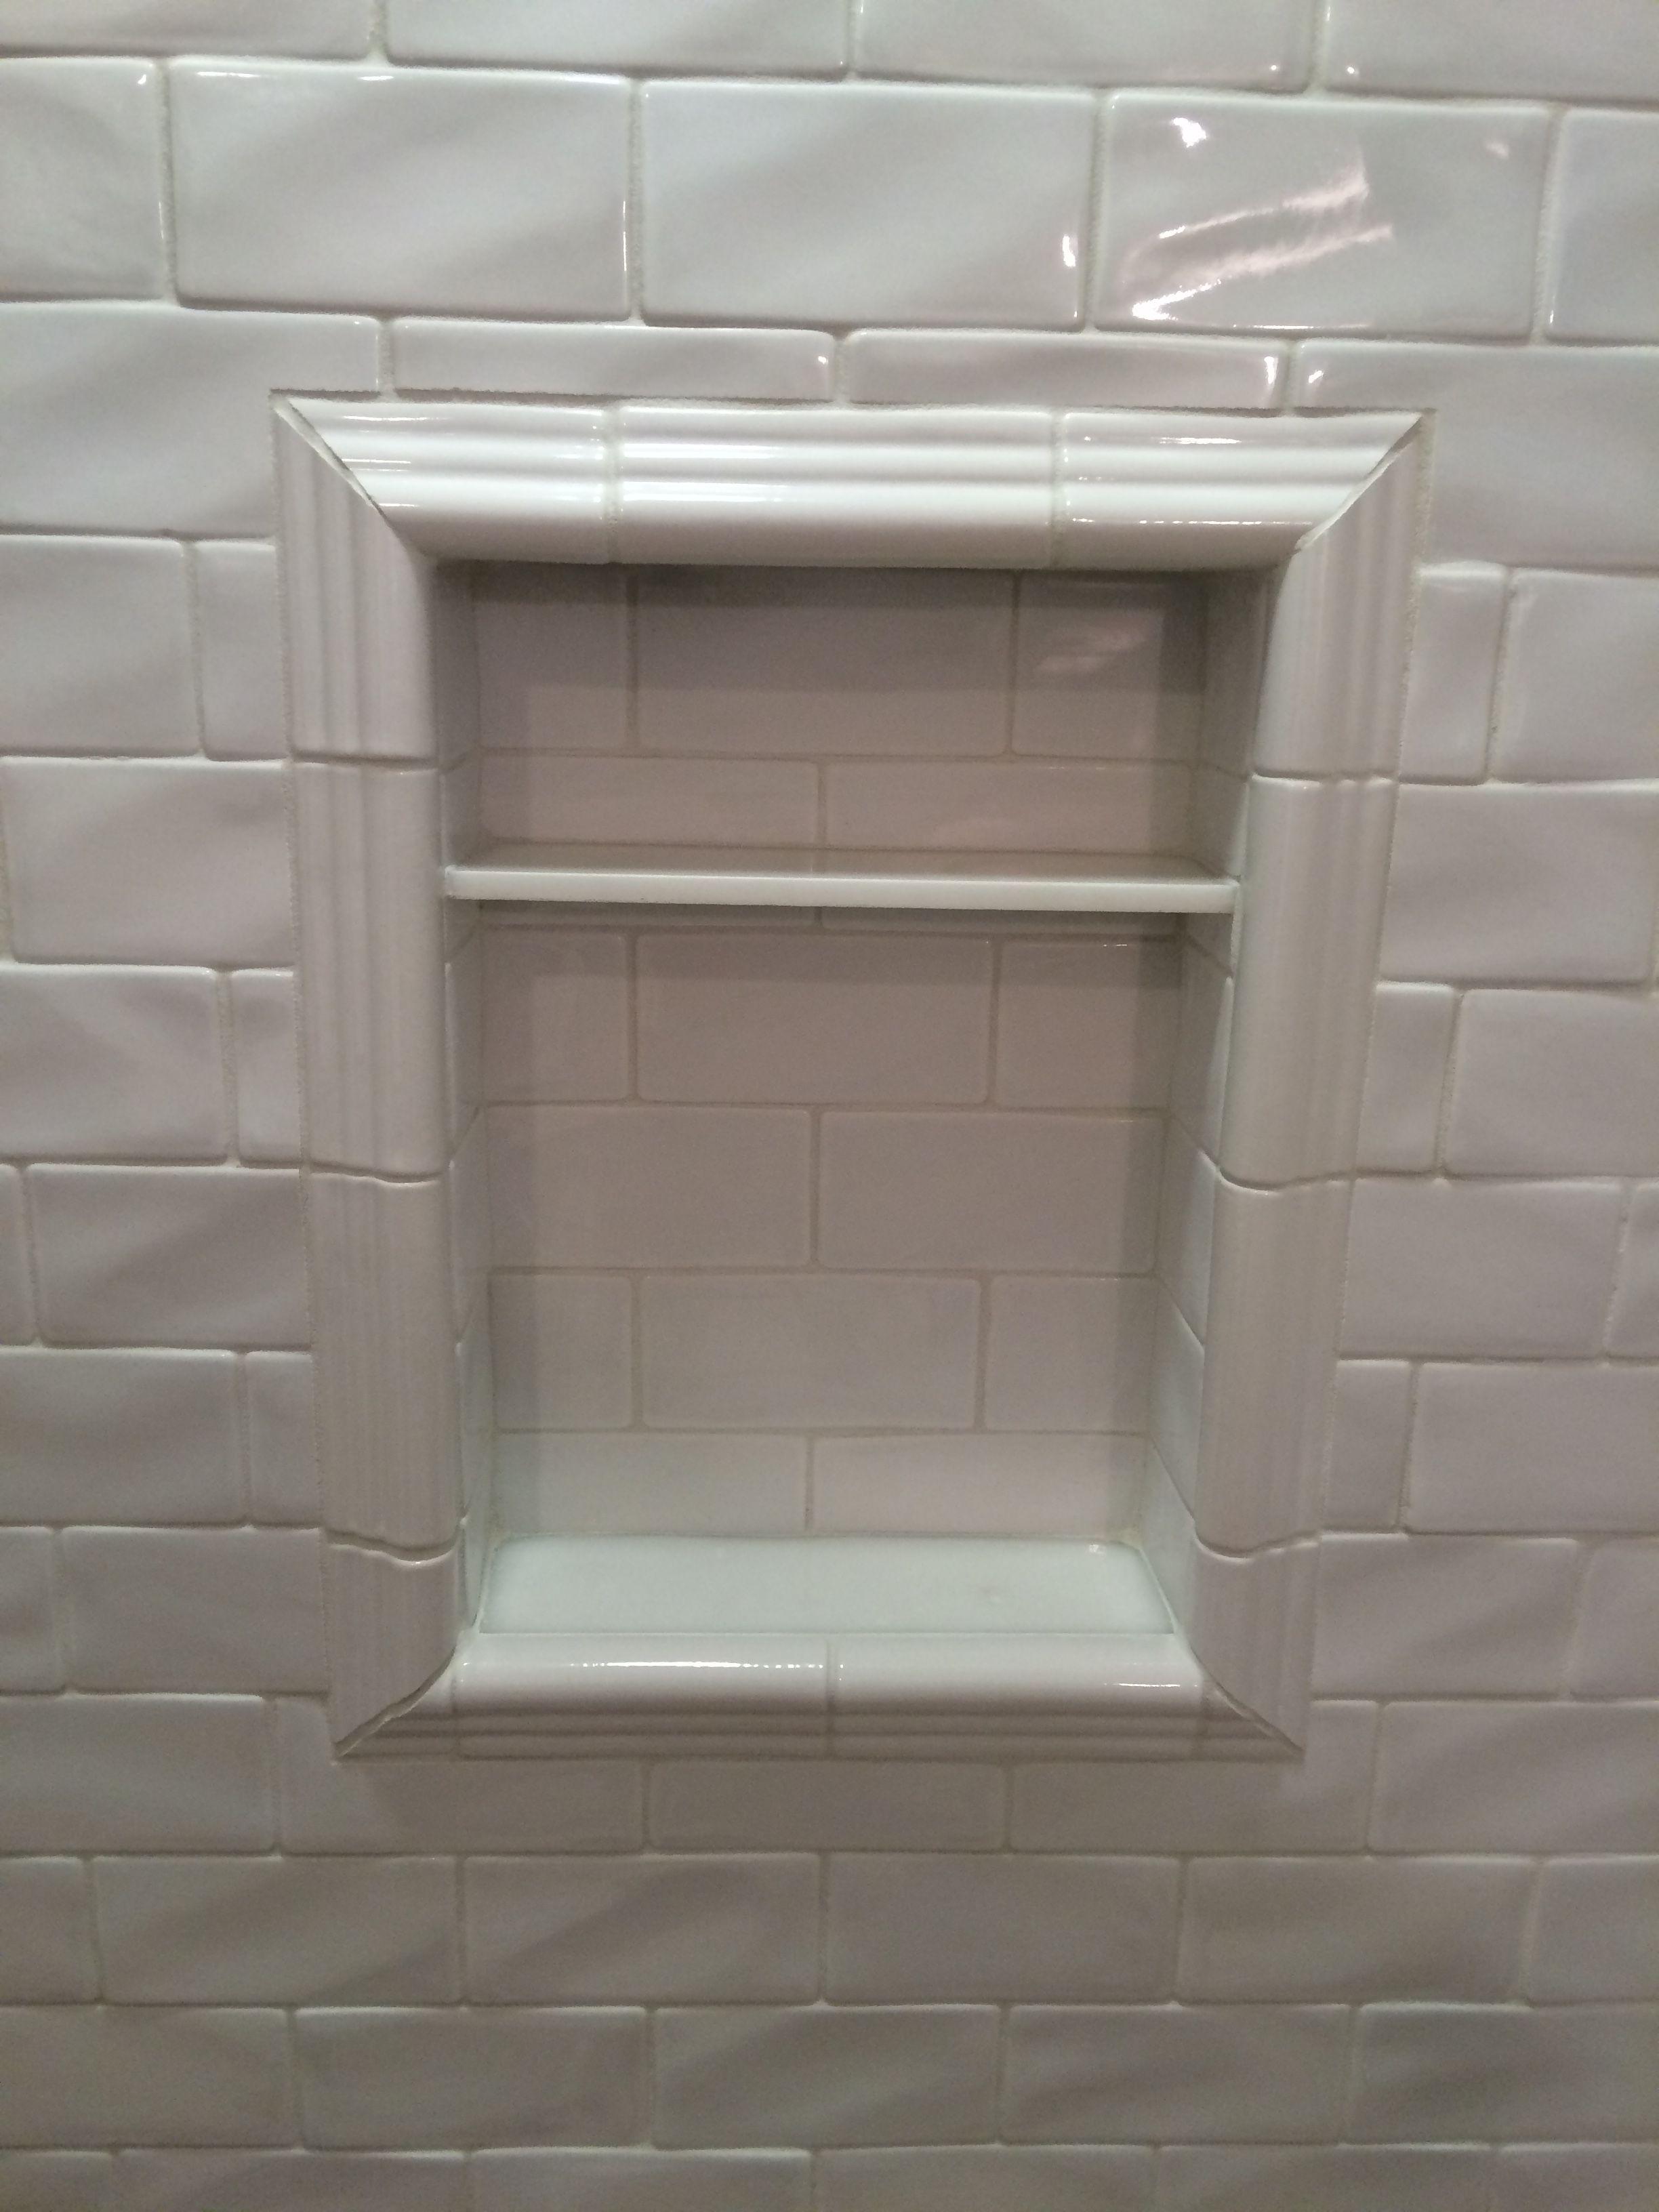 Mid america tile elk grove village - Highland Park Tile Shampoo Niche Marble Ledge And Shelf